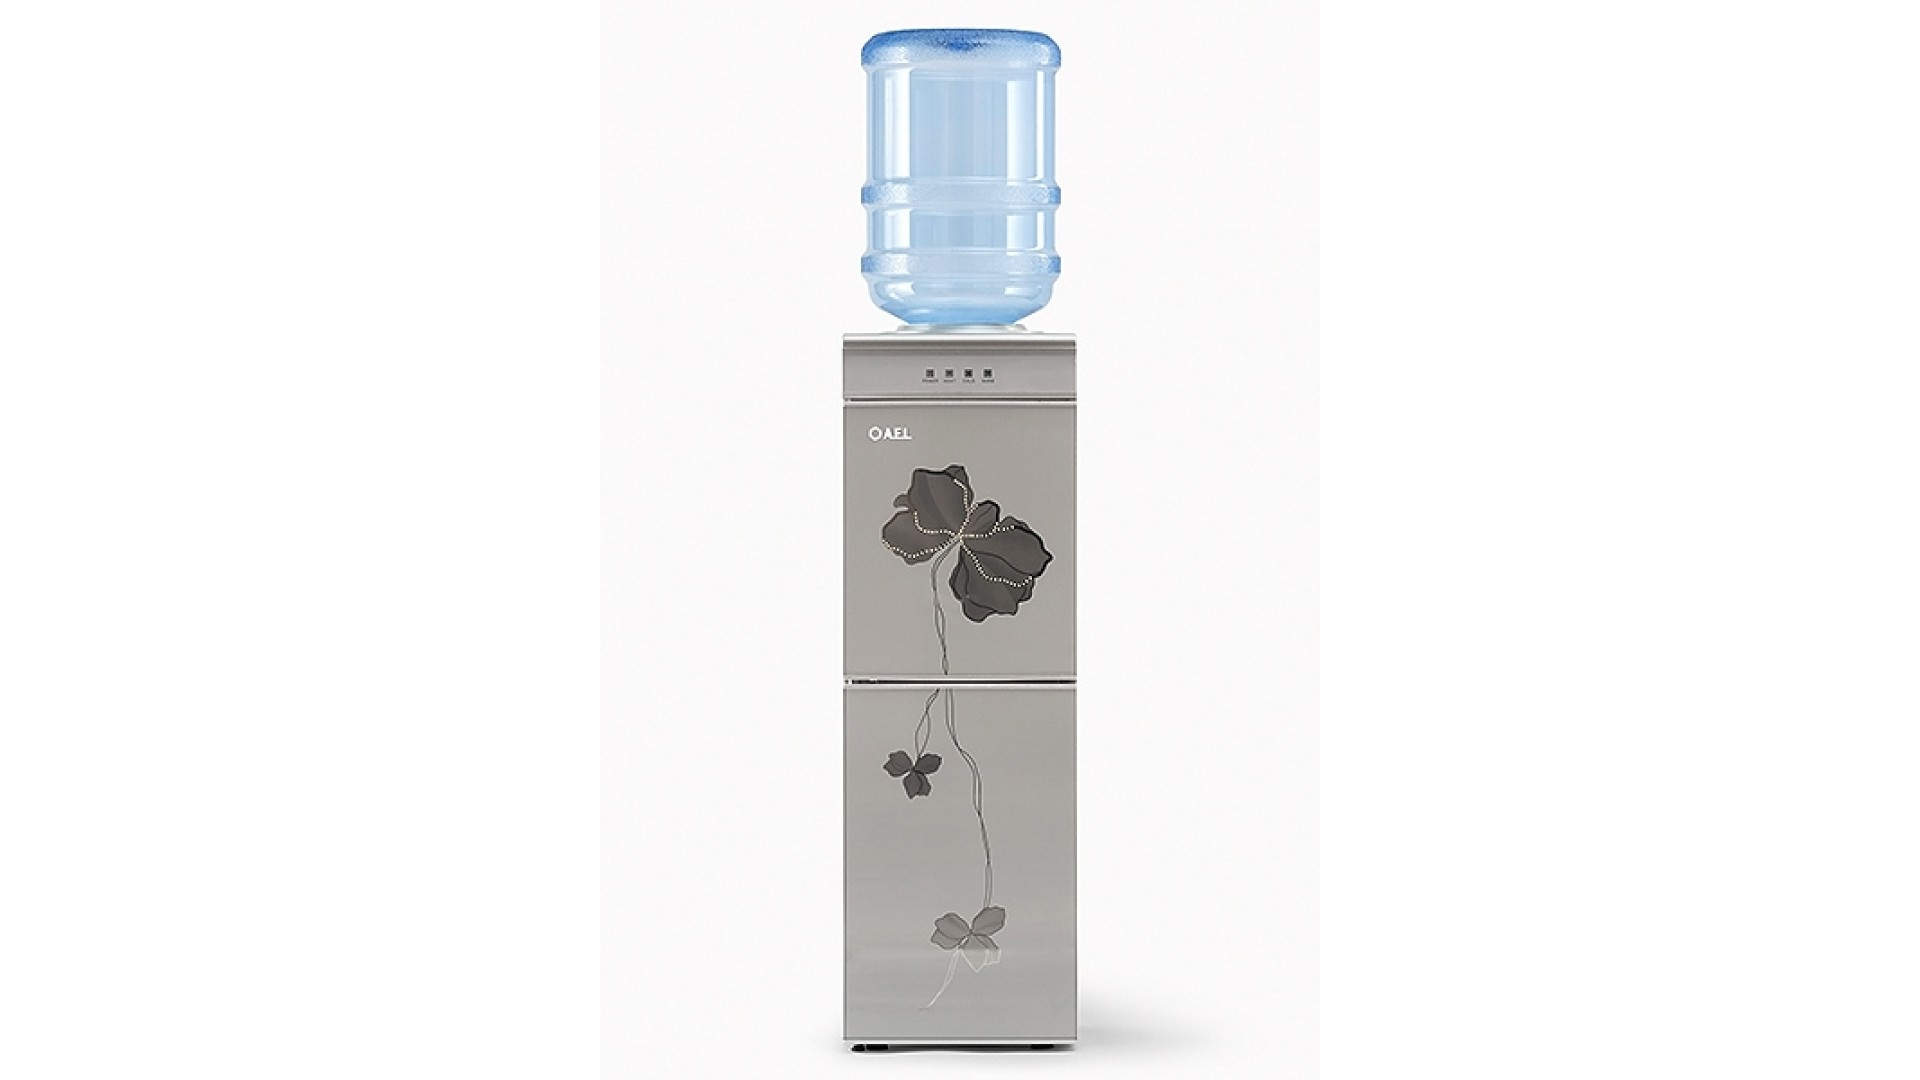 water-dispenser-lc-ael-601b